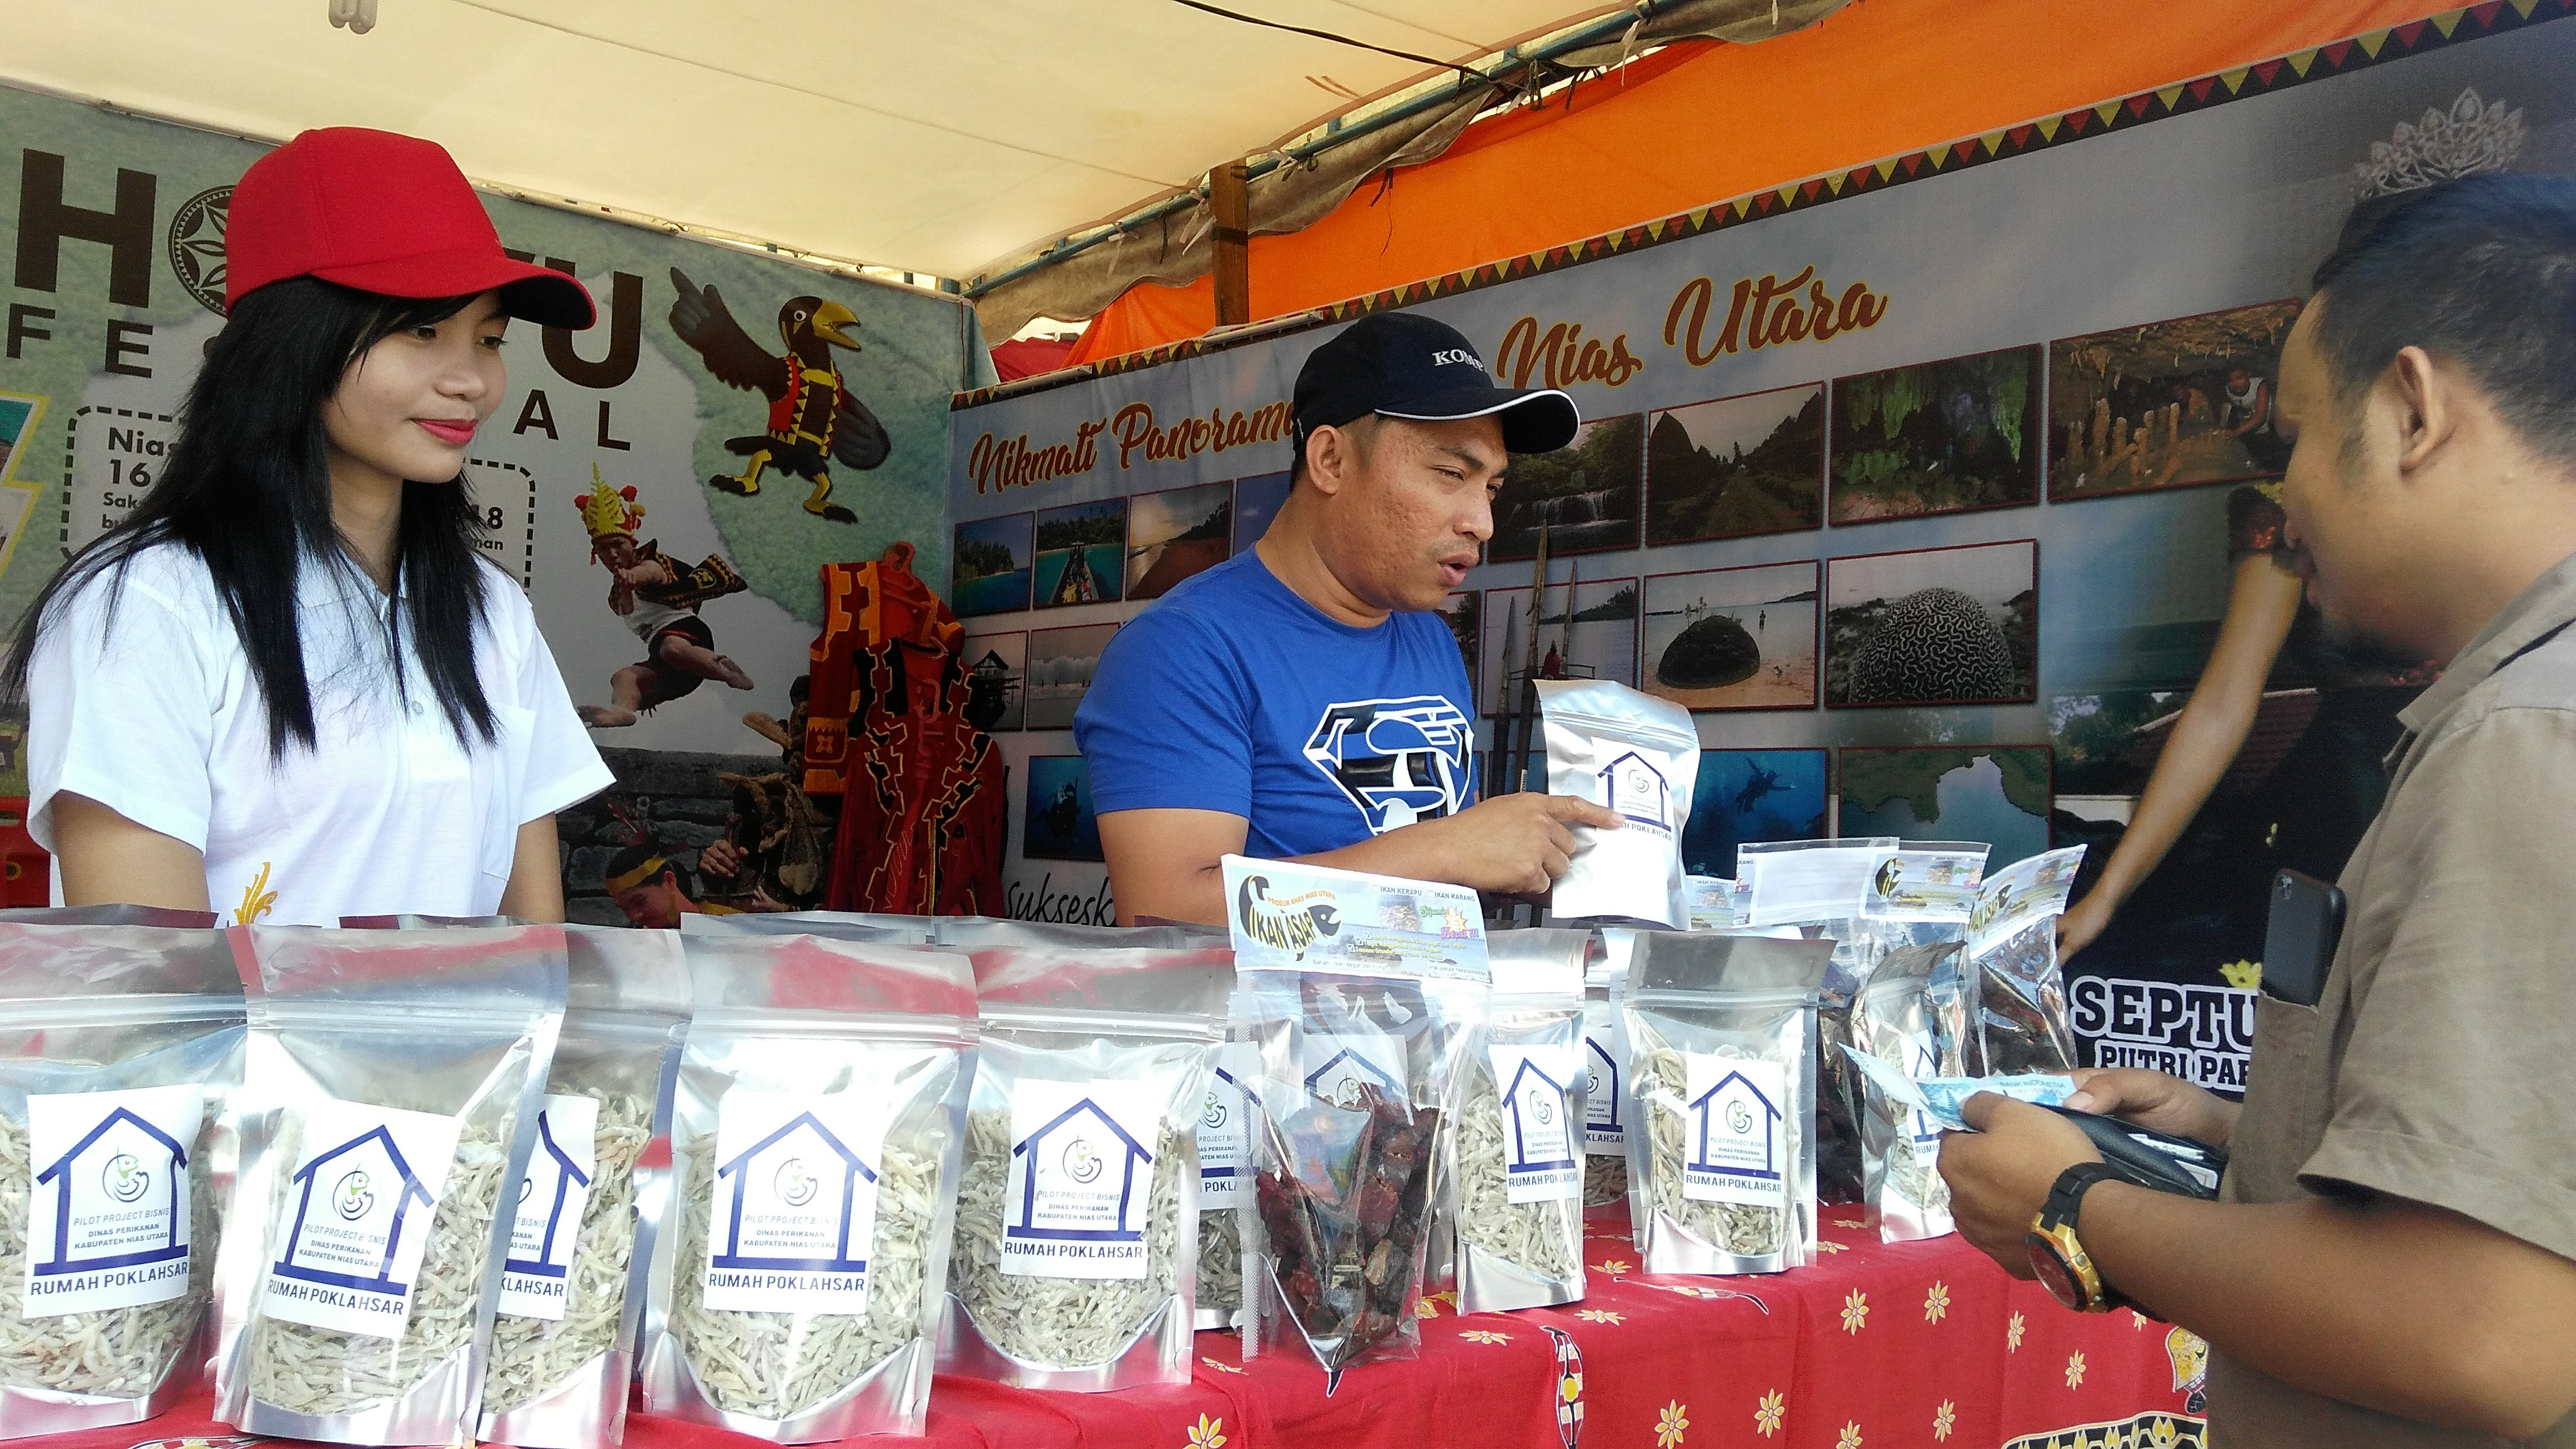 Stan Nias Utara Peringkat Ketiga pada Festival Harimbale